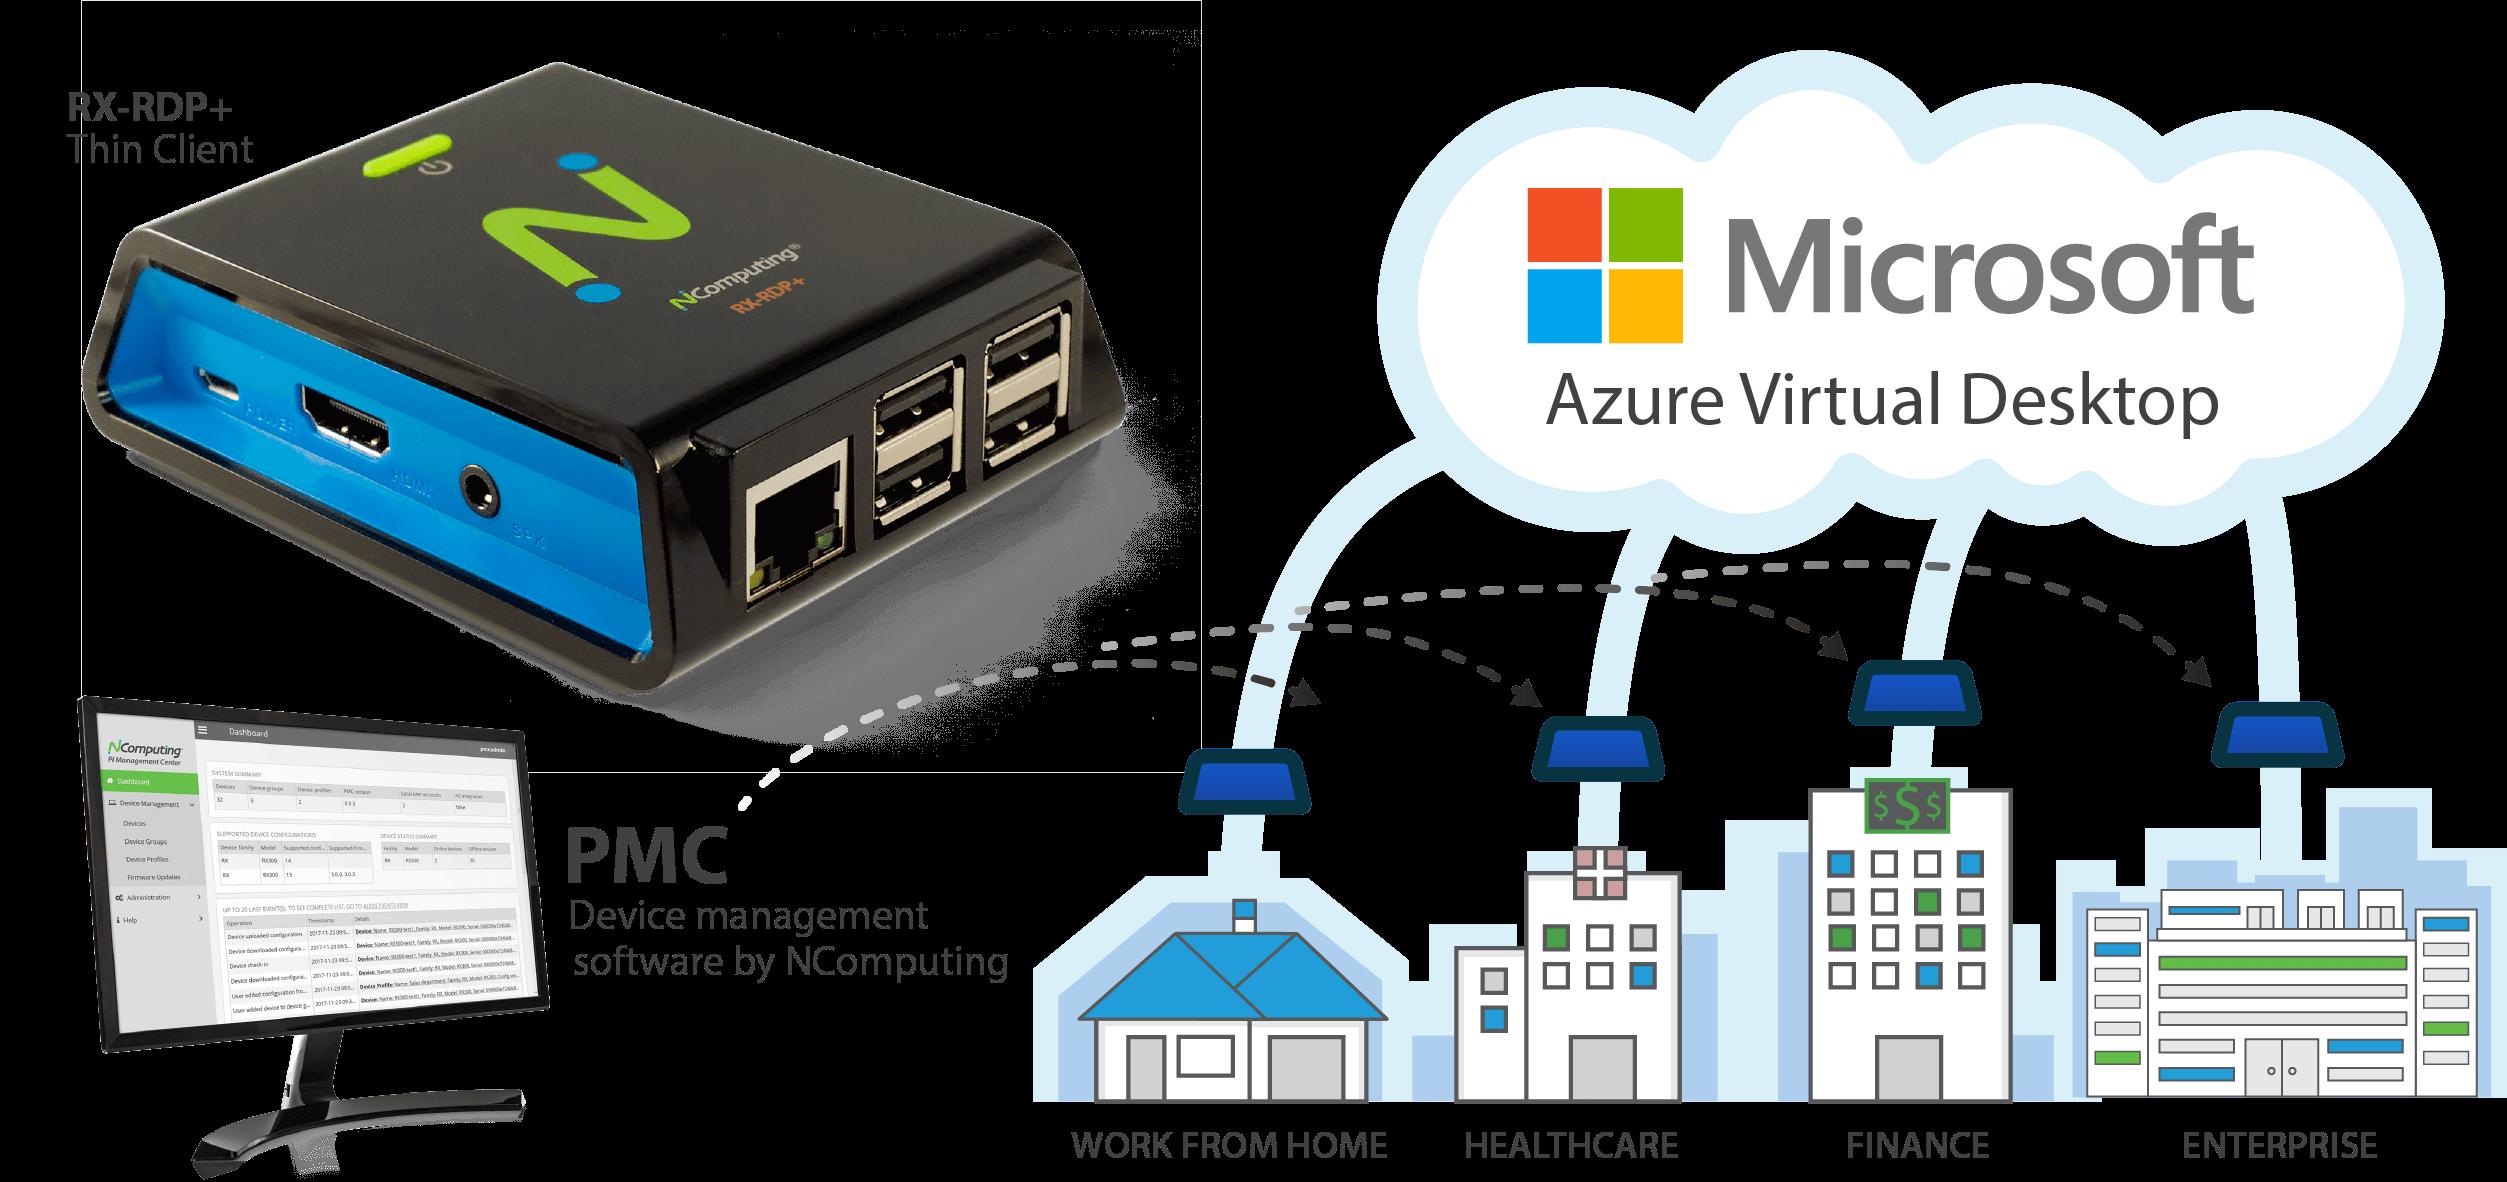 RX-RDP/RX-RDP+专为Microsoft AVD、Microsoft RDS、VERDE VDI 和远程 PC 访问以及 vSpace Pro桌面虚拟化而设计的下一代云PC